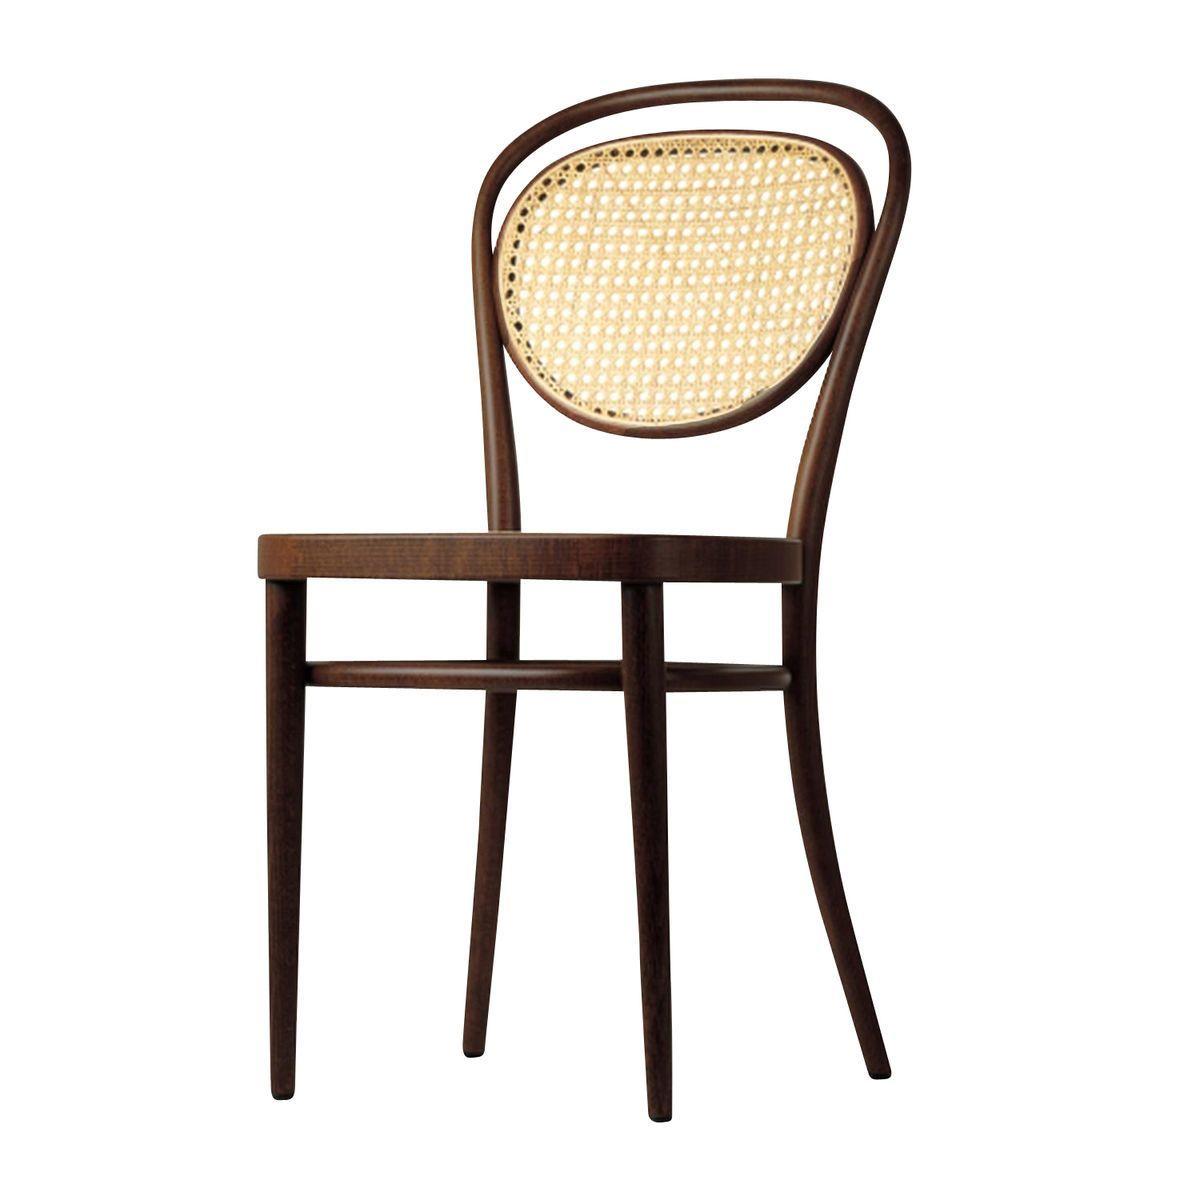 thonet 215 r chair thonet. Black Bedroom Furniture Sets. Home Design Ideas